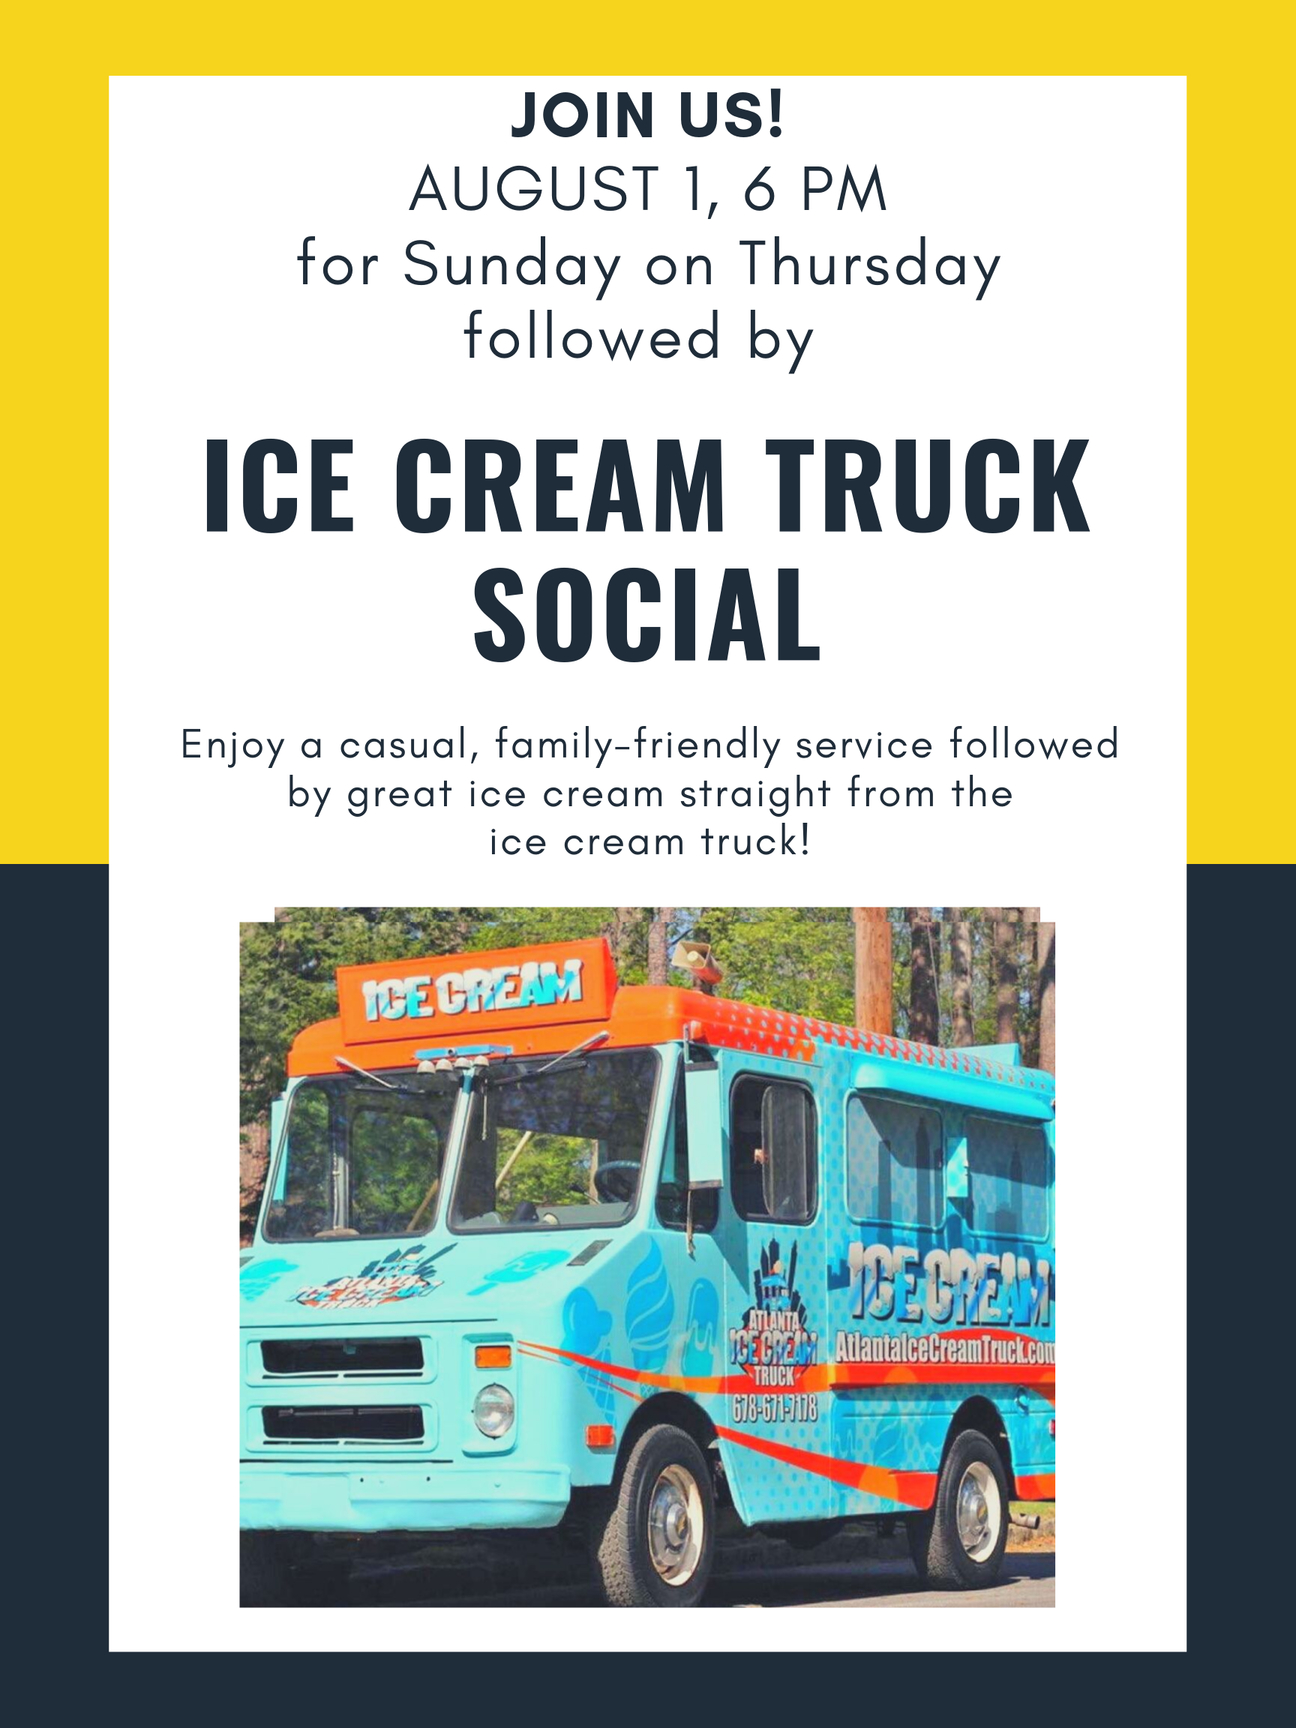 Ice Cream Social 960 Kb.jpg